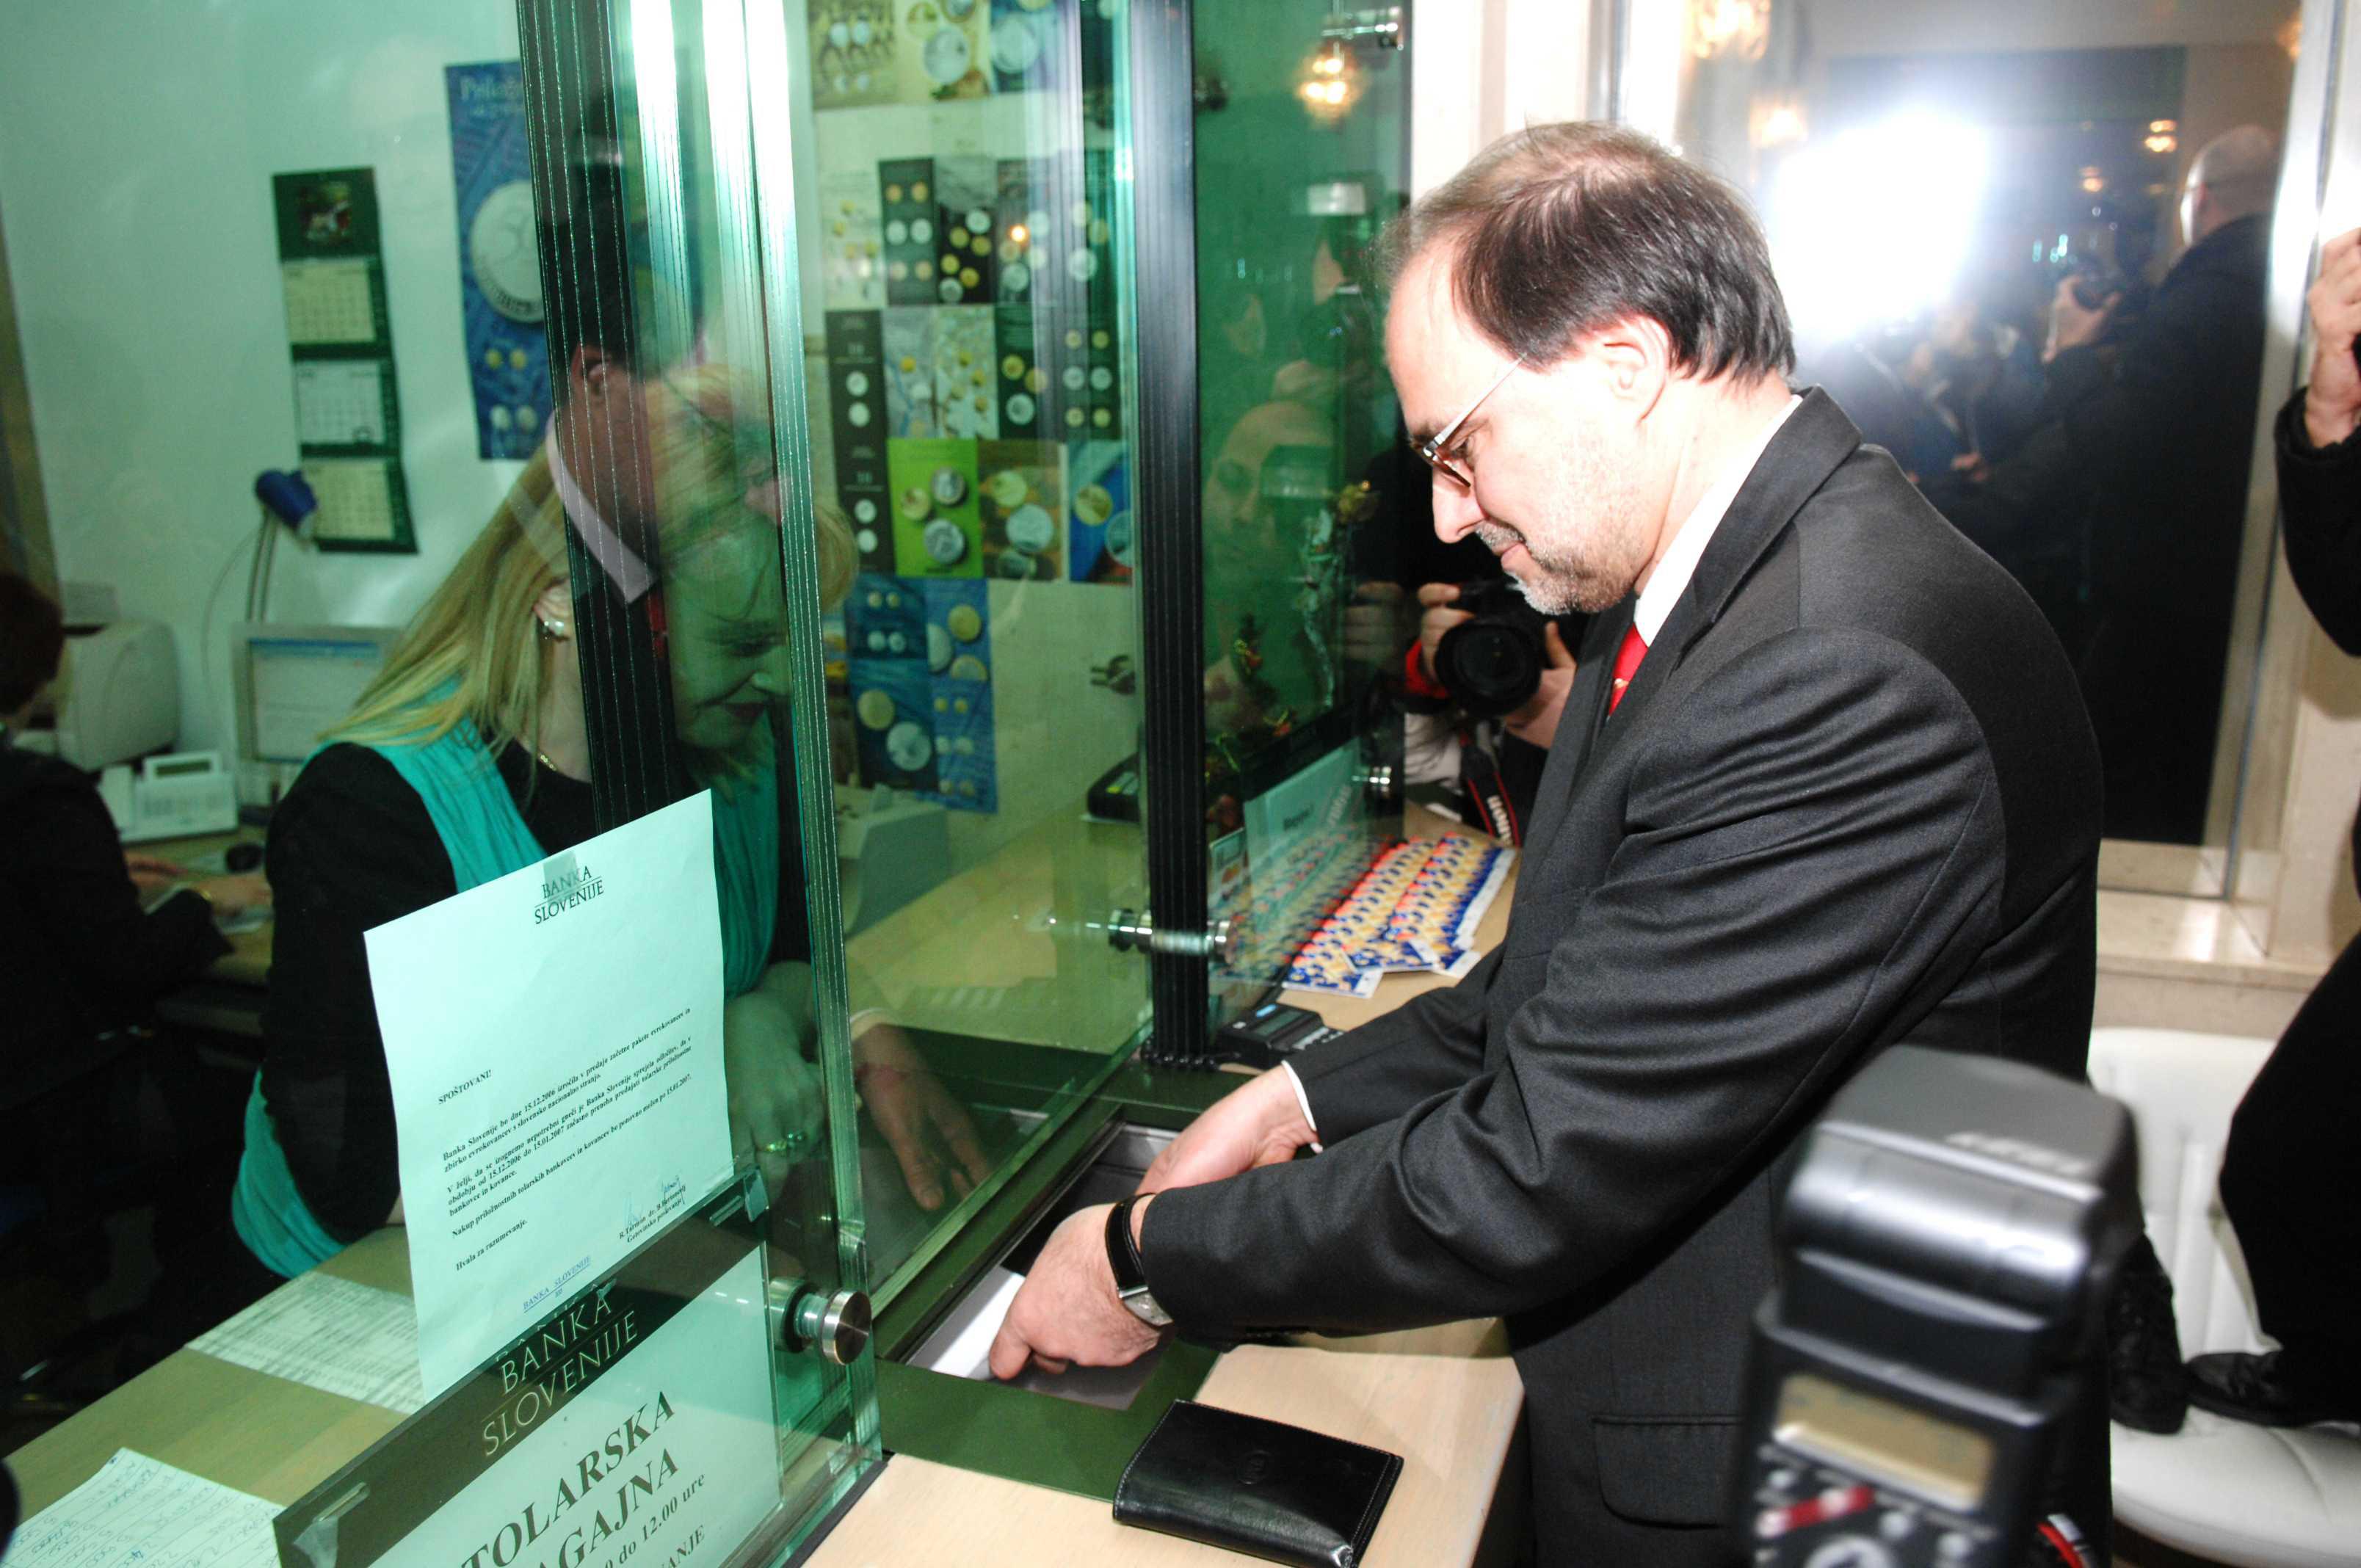 bank cashier inspirenow cashier at bank related keywords amp suggestions cashier at bank keyword images